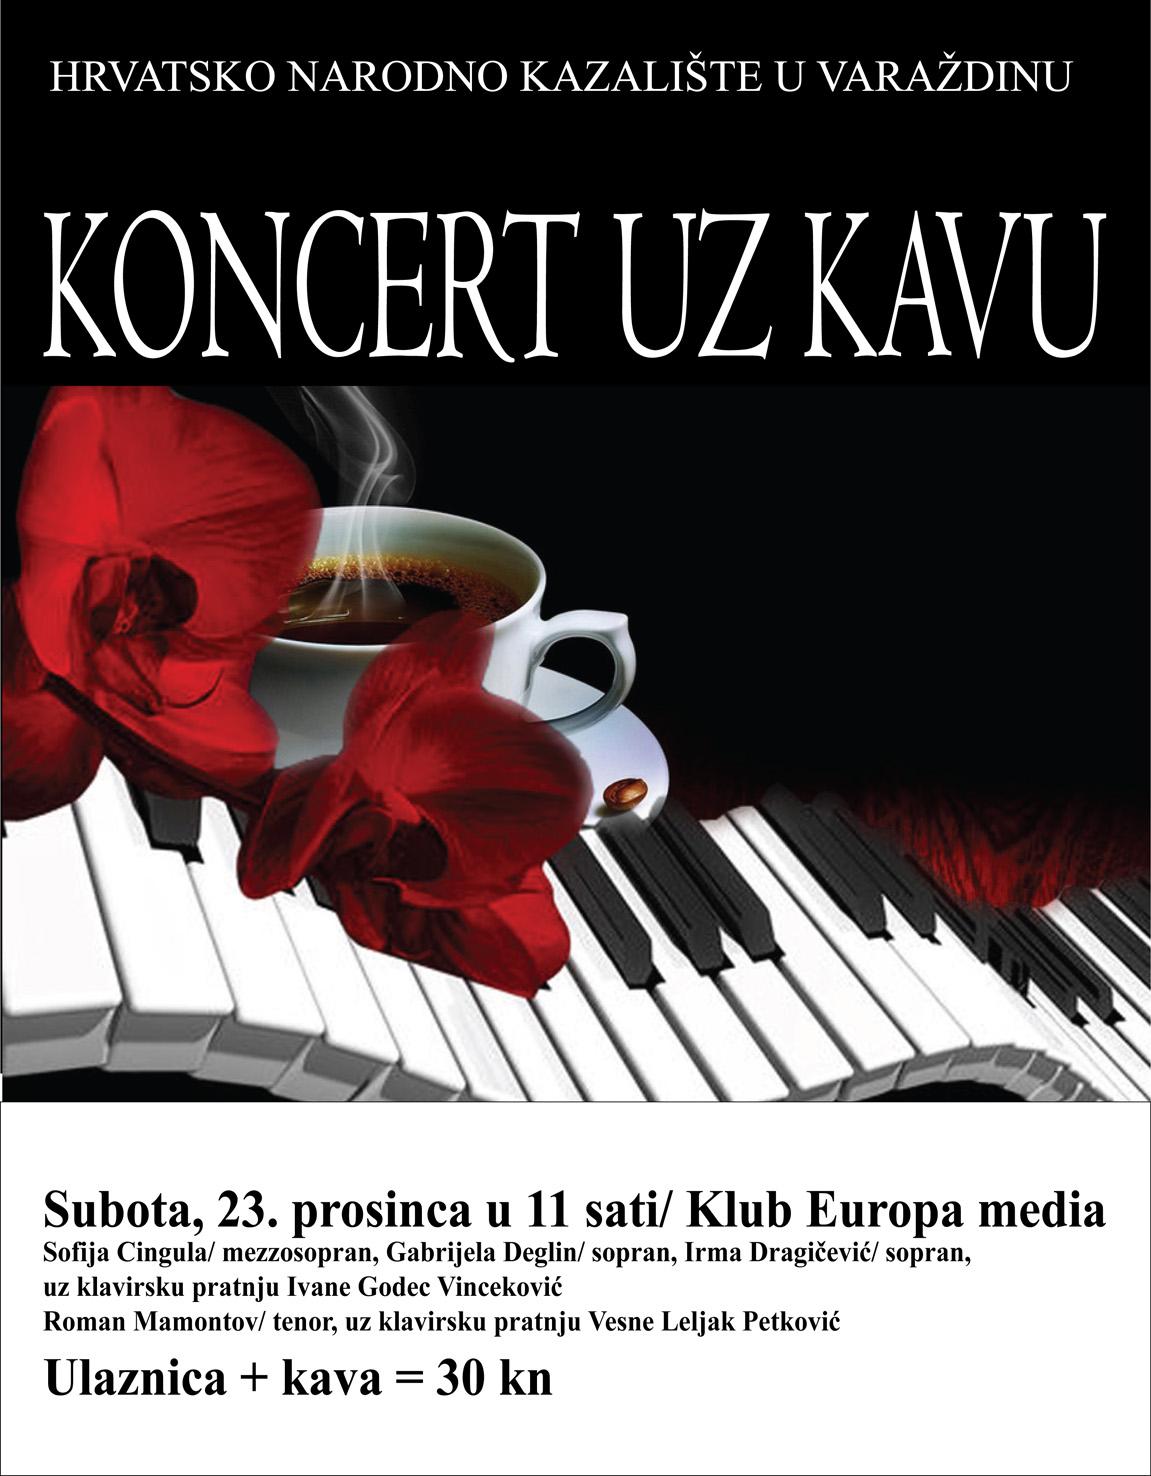 koncert 29. travnja